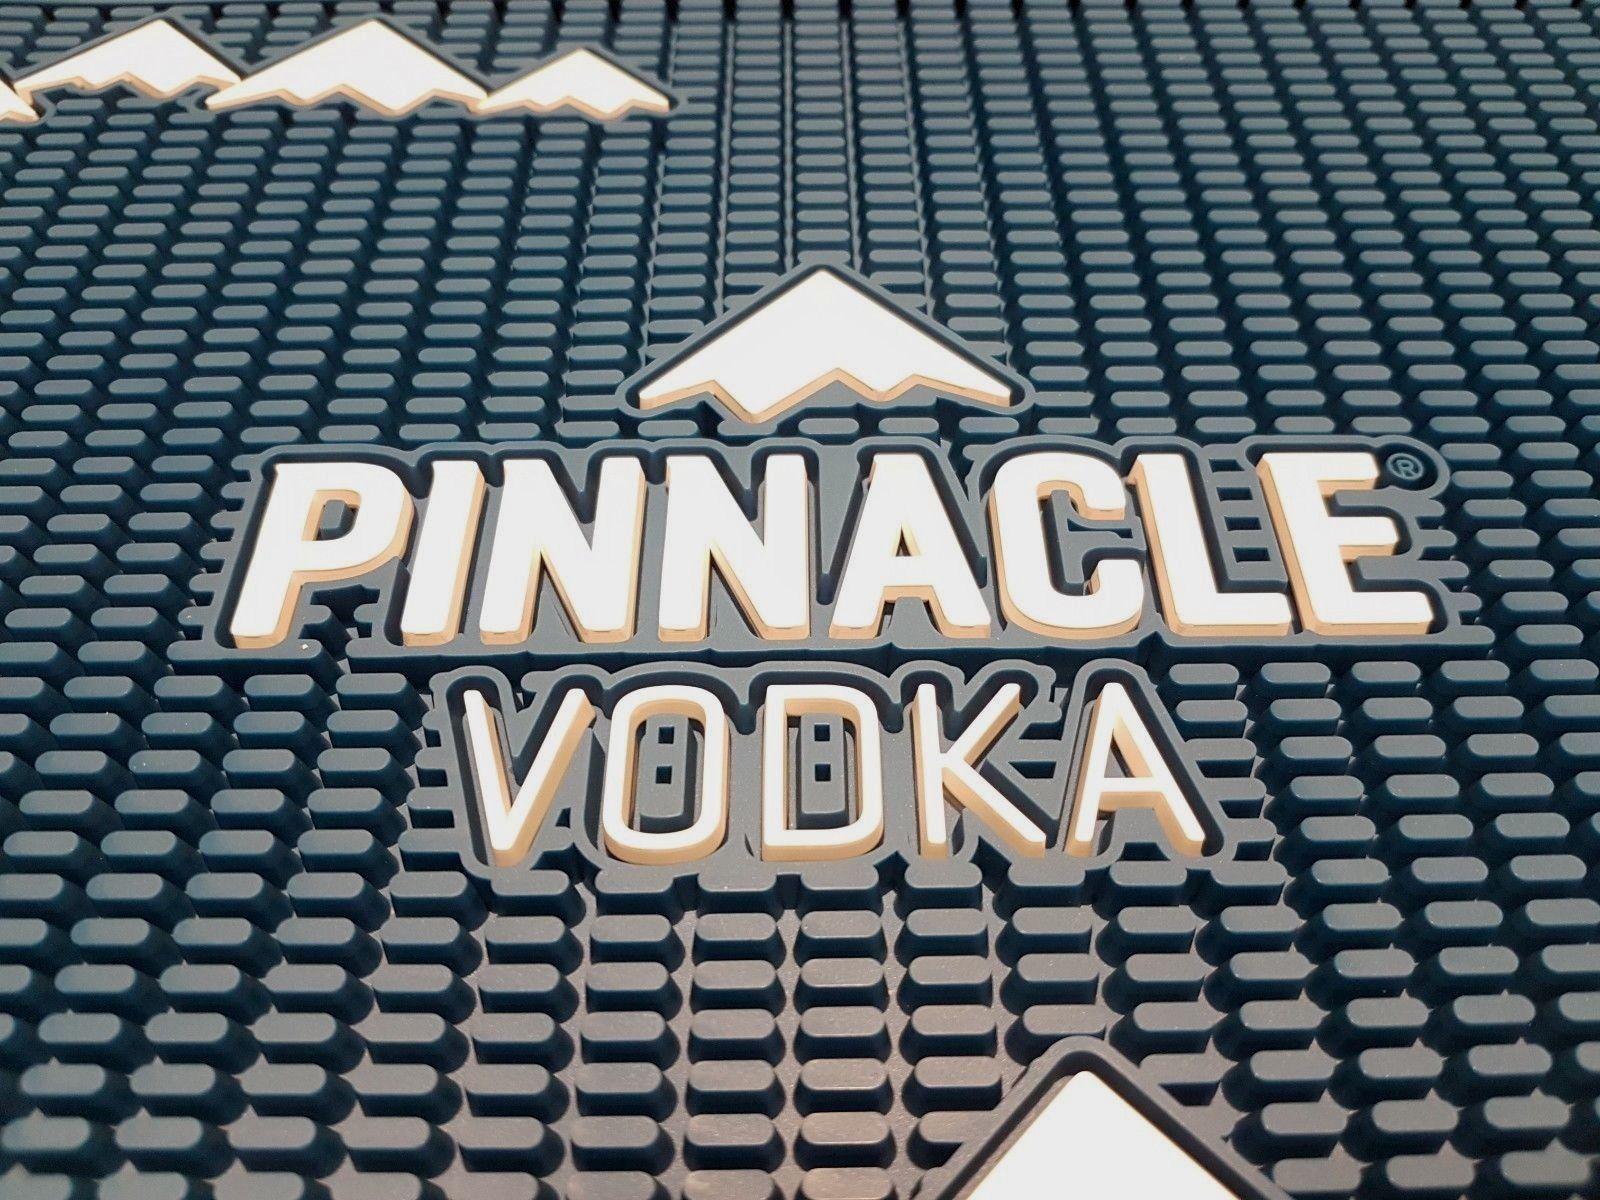 Pinnacle Vodka Bar Mat #PI171000359